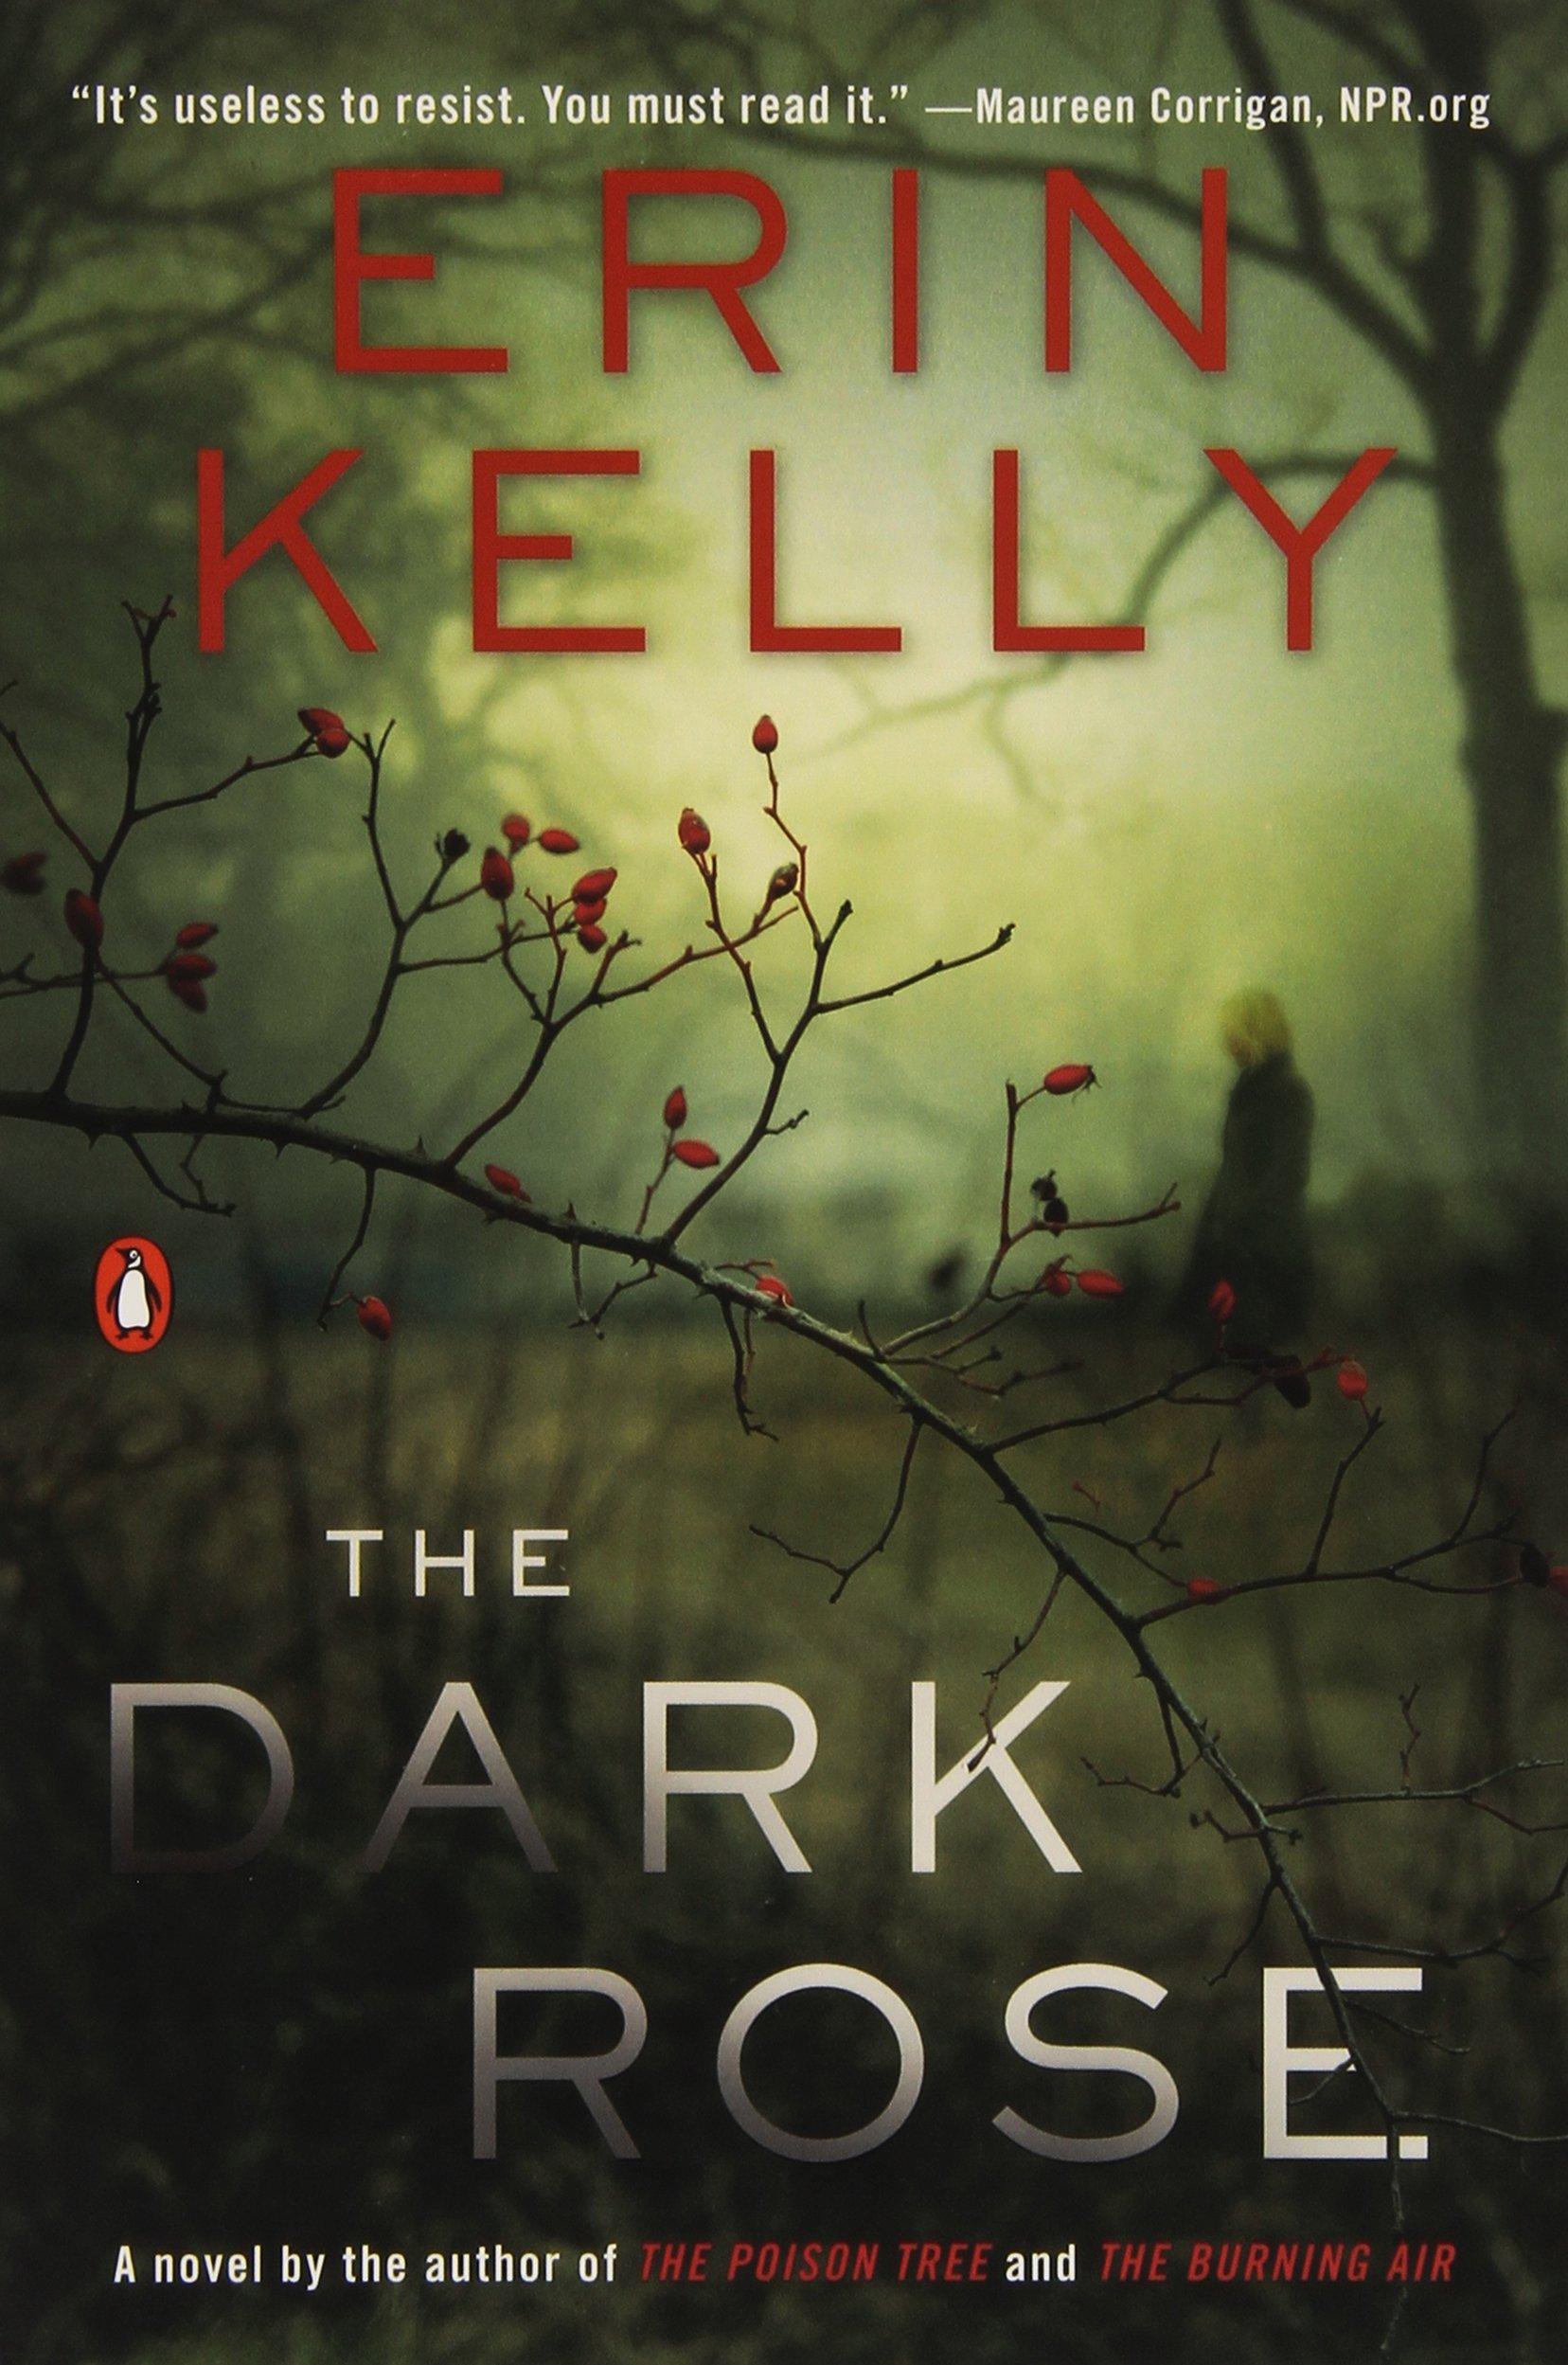 The Dark Rose by Erin Kelly